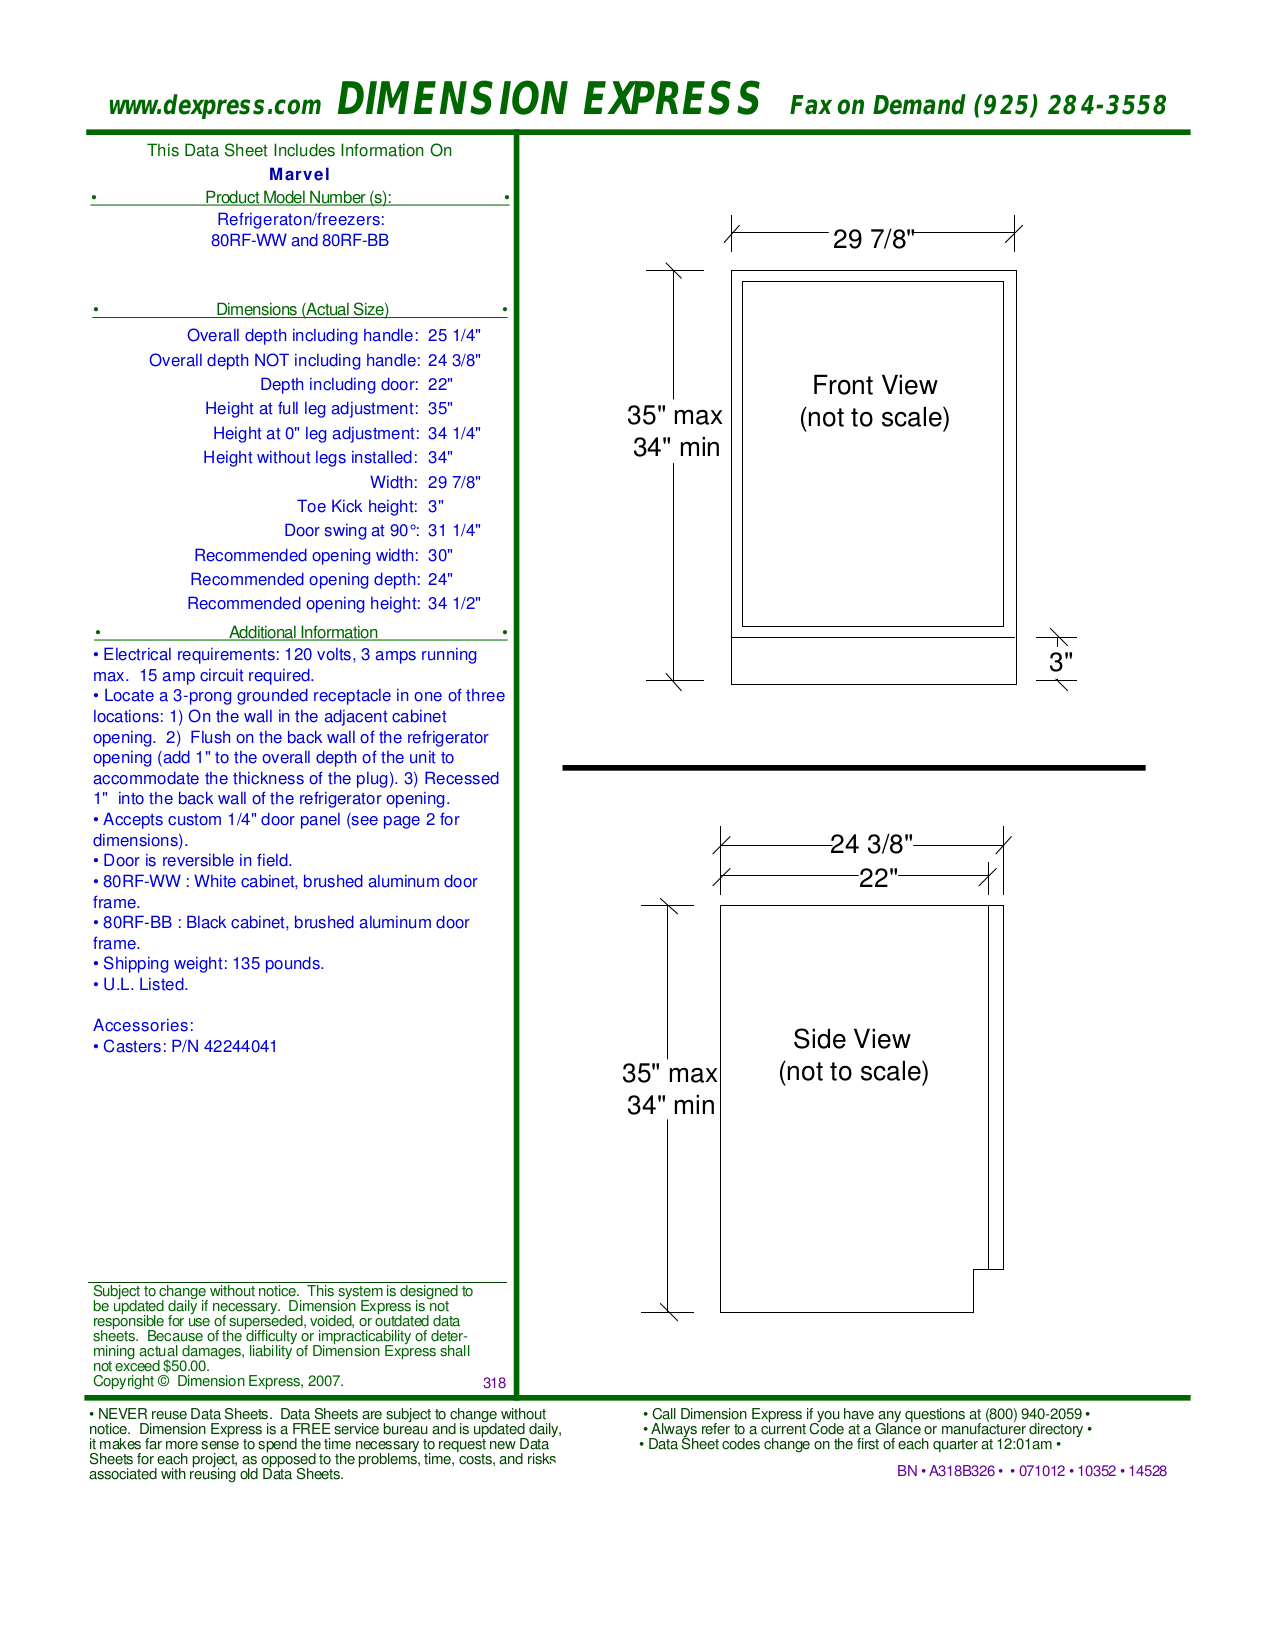 pdf for Marvel Refrigerator 80RF-WW manual